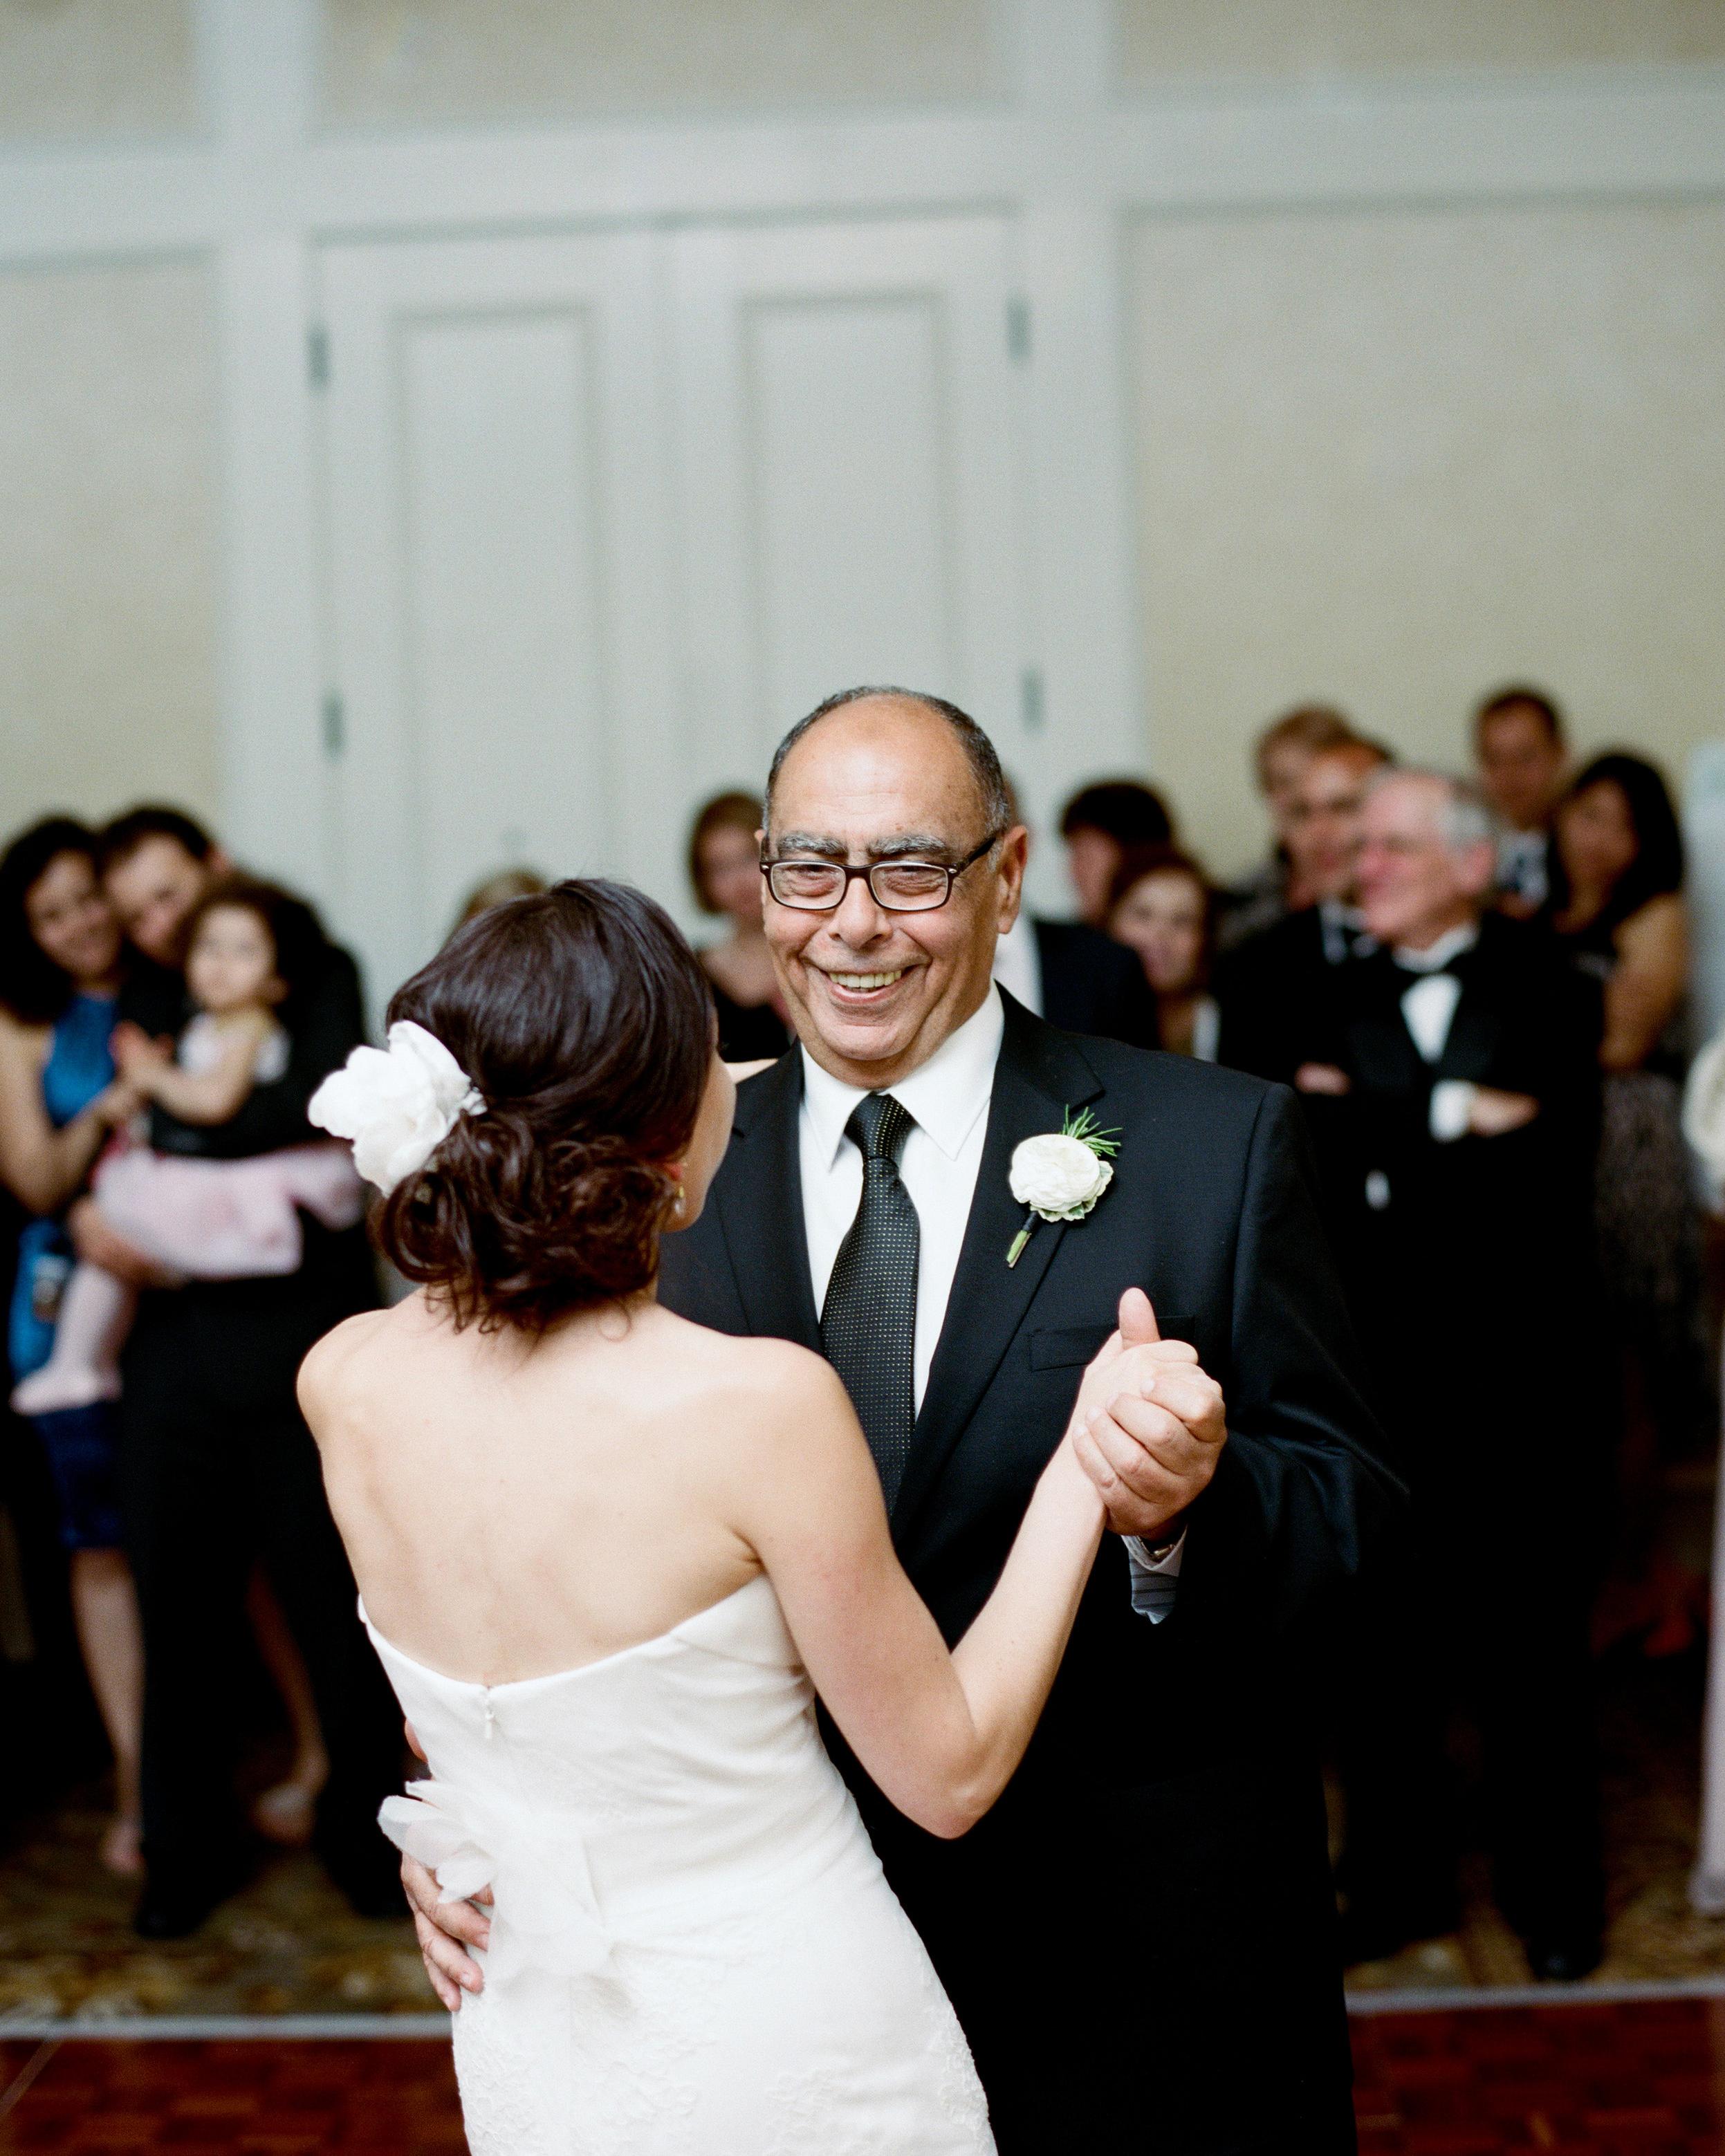 marwa-peter-wedding-daddance-0414.jpg